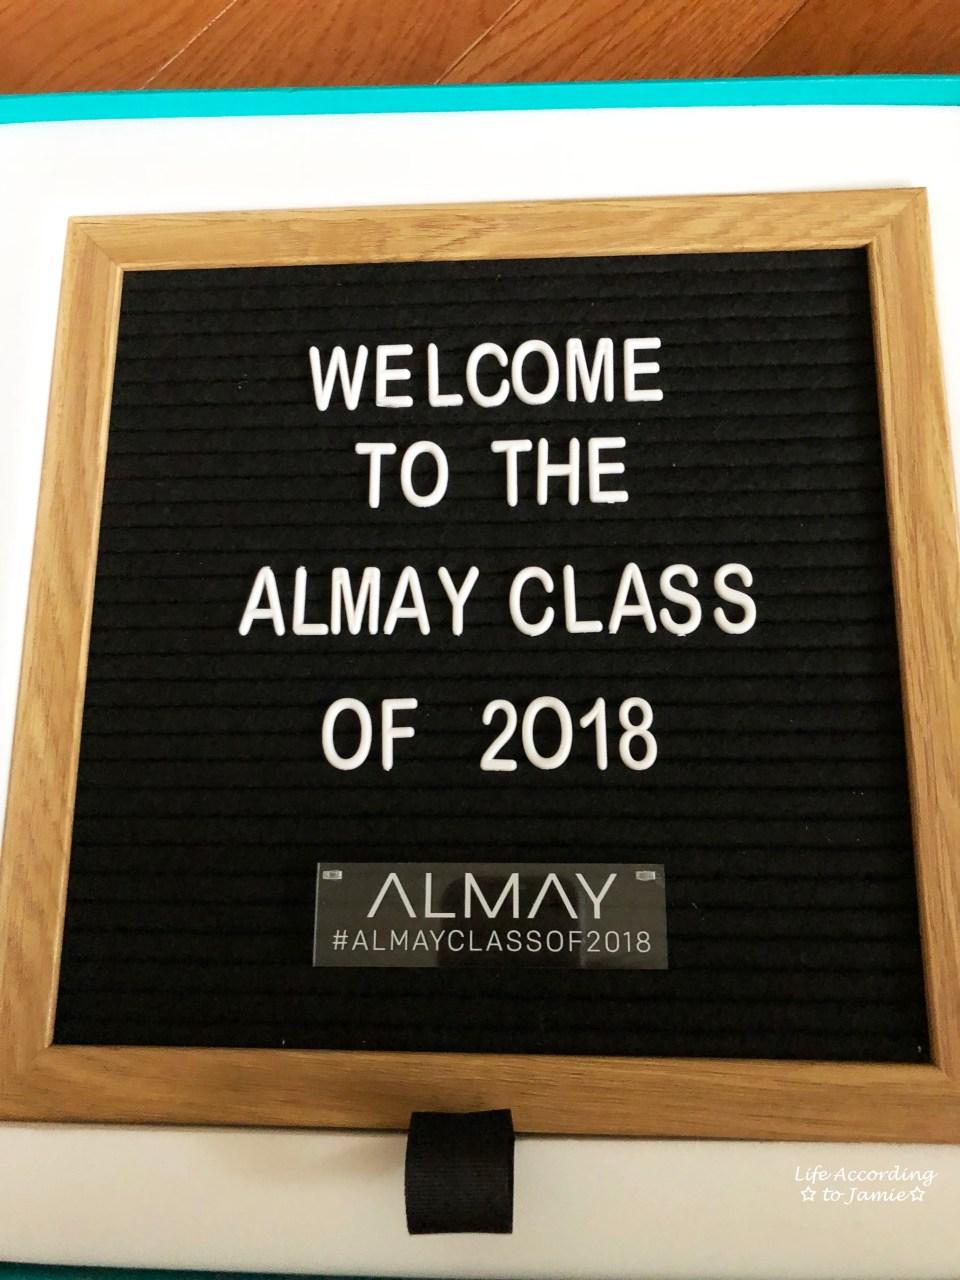 Almay Class of 2018 2